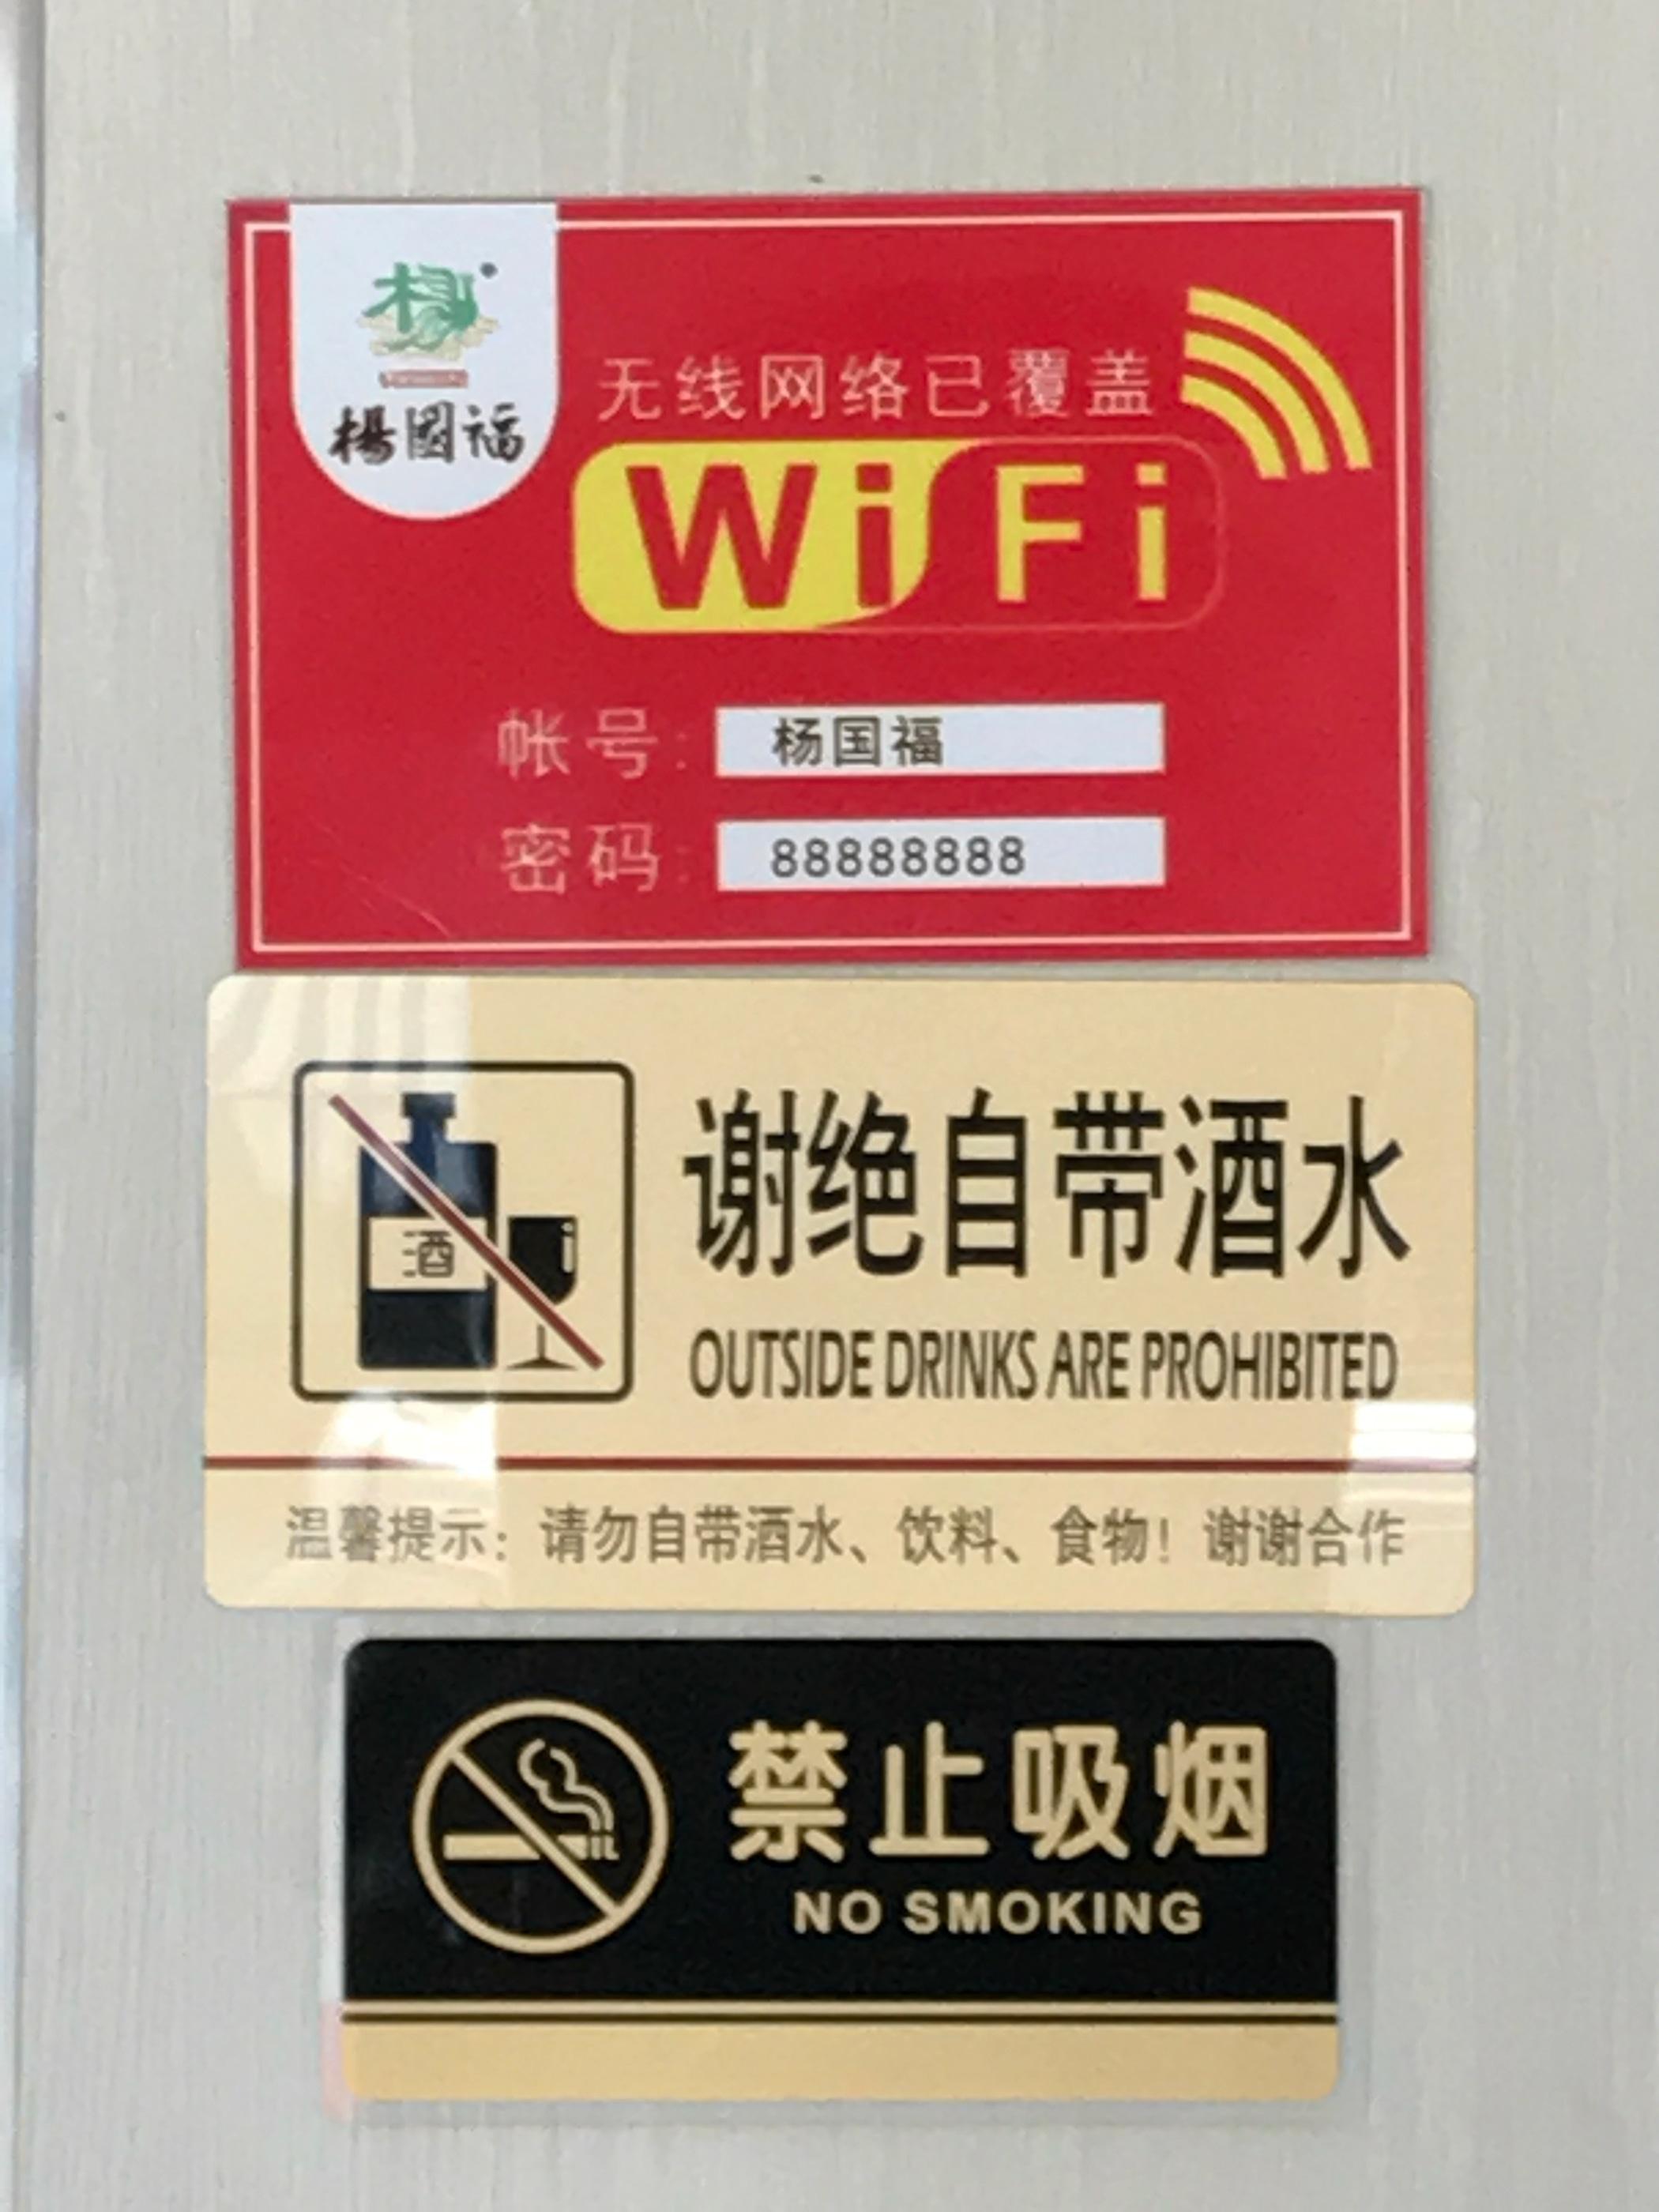 Senha 88888888 de Wi-Fi na China